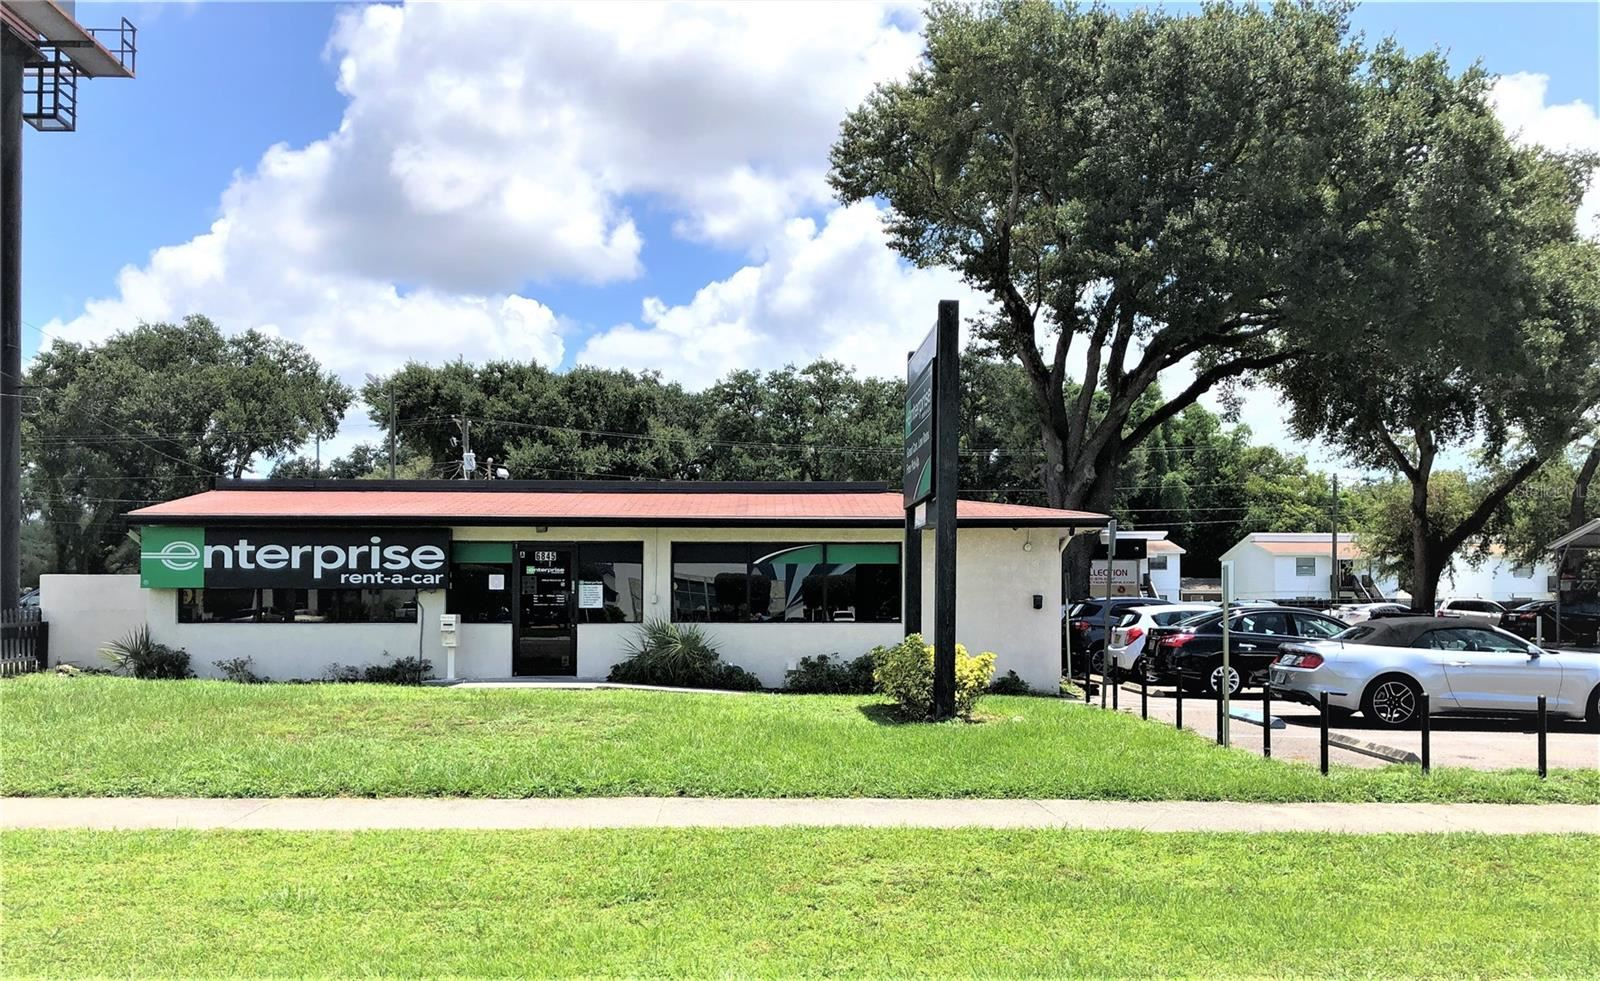 6845 N DALE MABRY HIGHWAY, Tampa, FL 33614 - #: T3321335